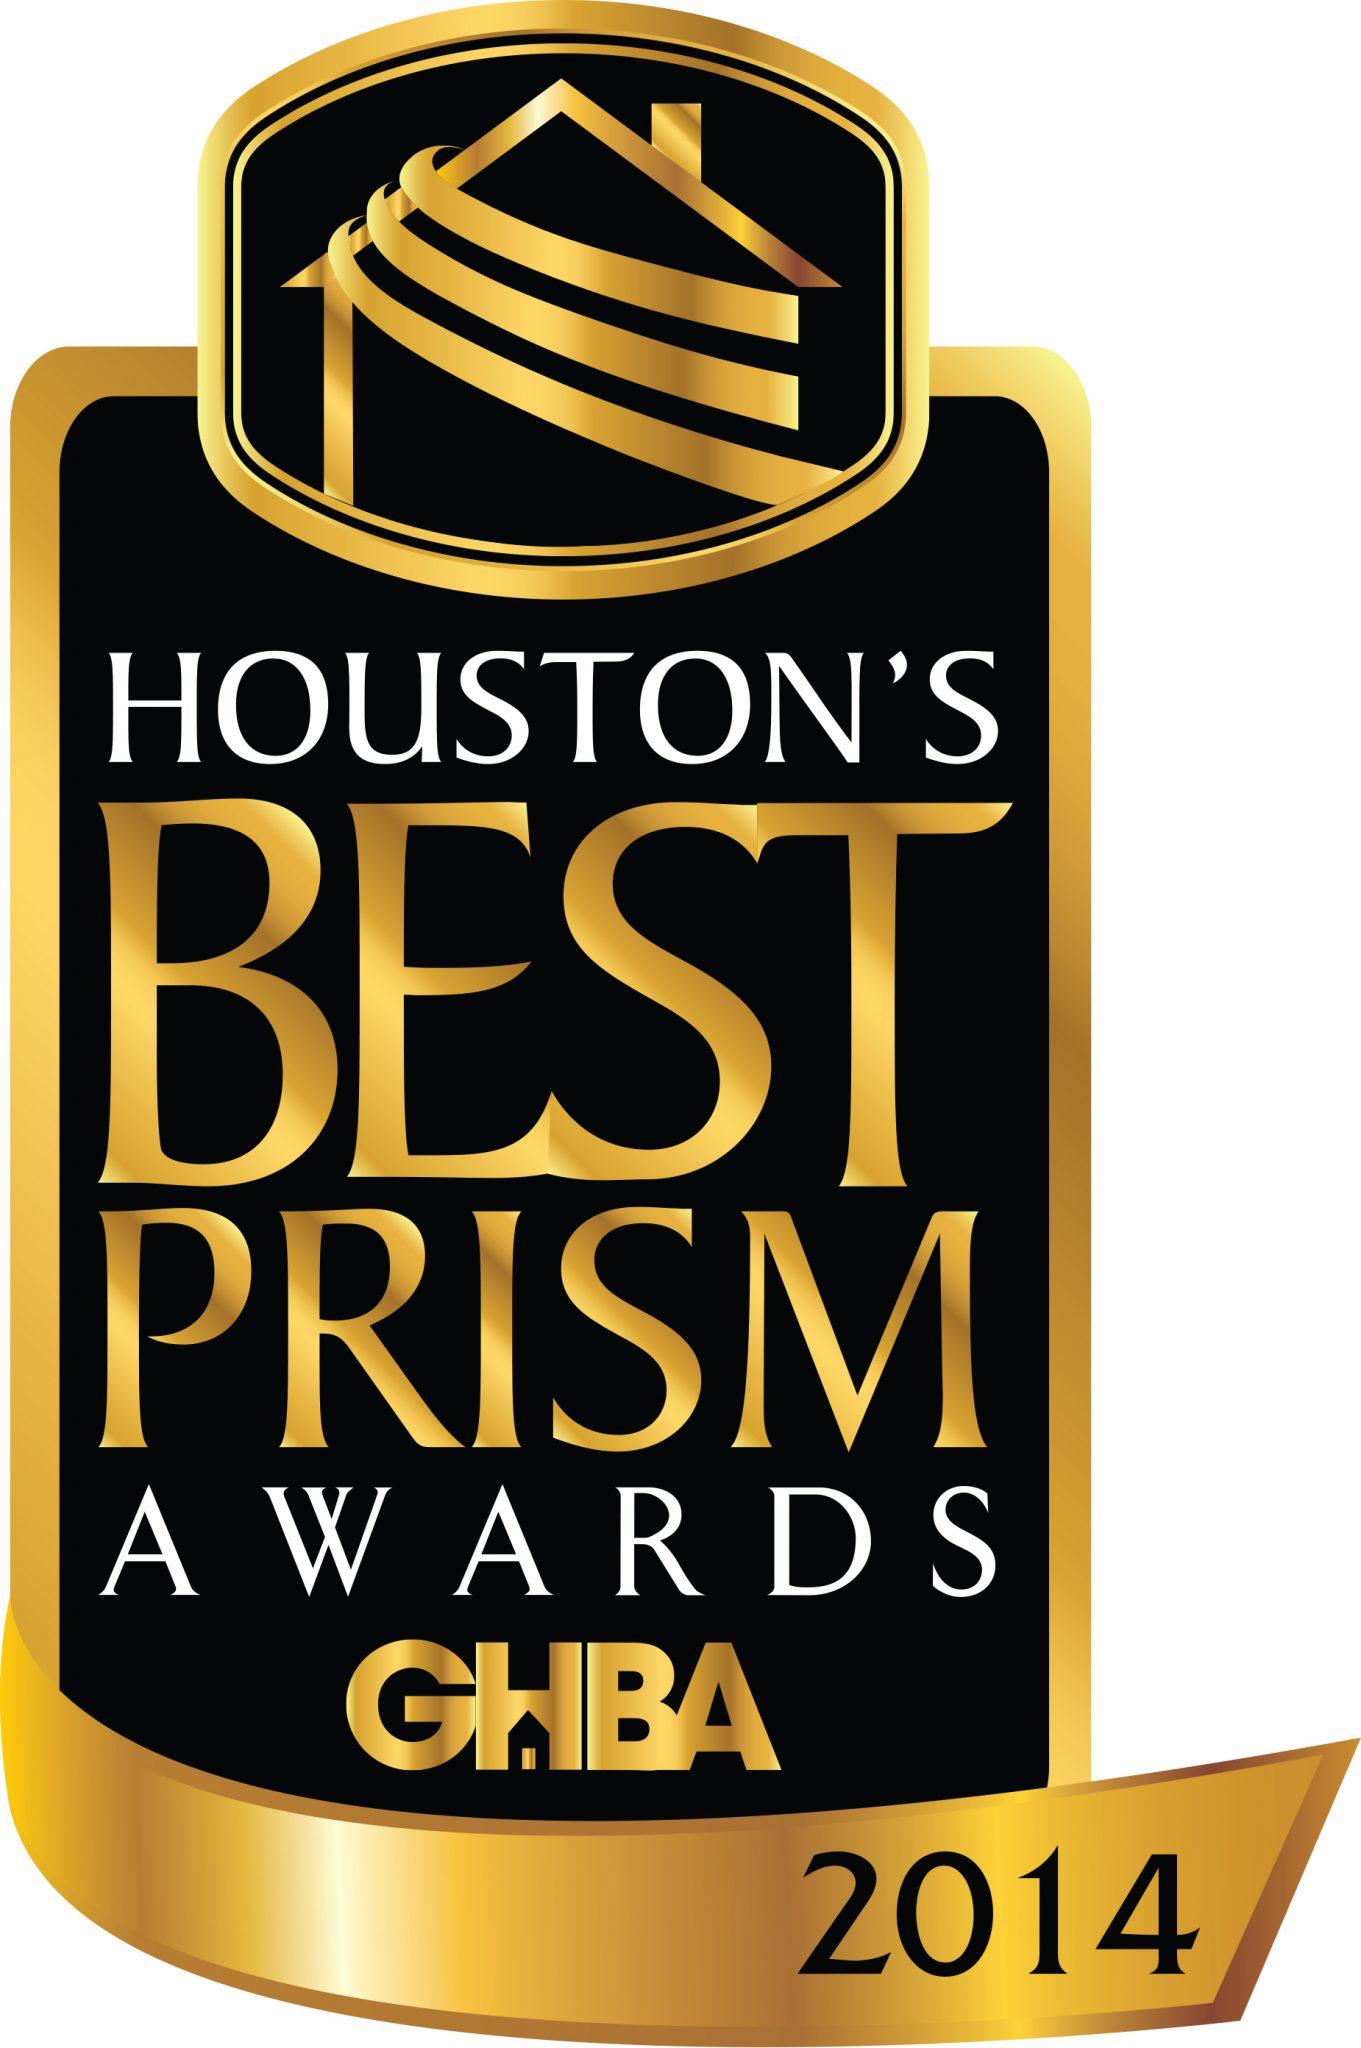 HB PRISM 2014 LogoColor